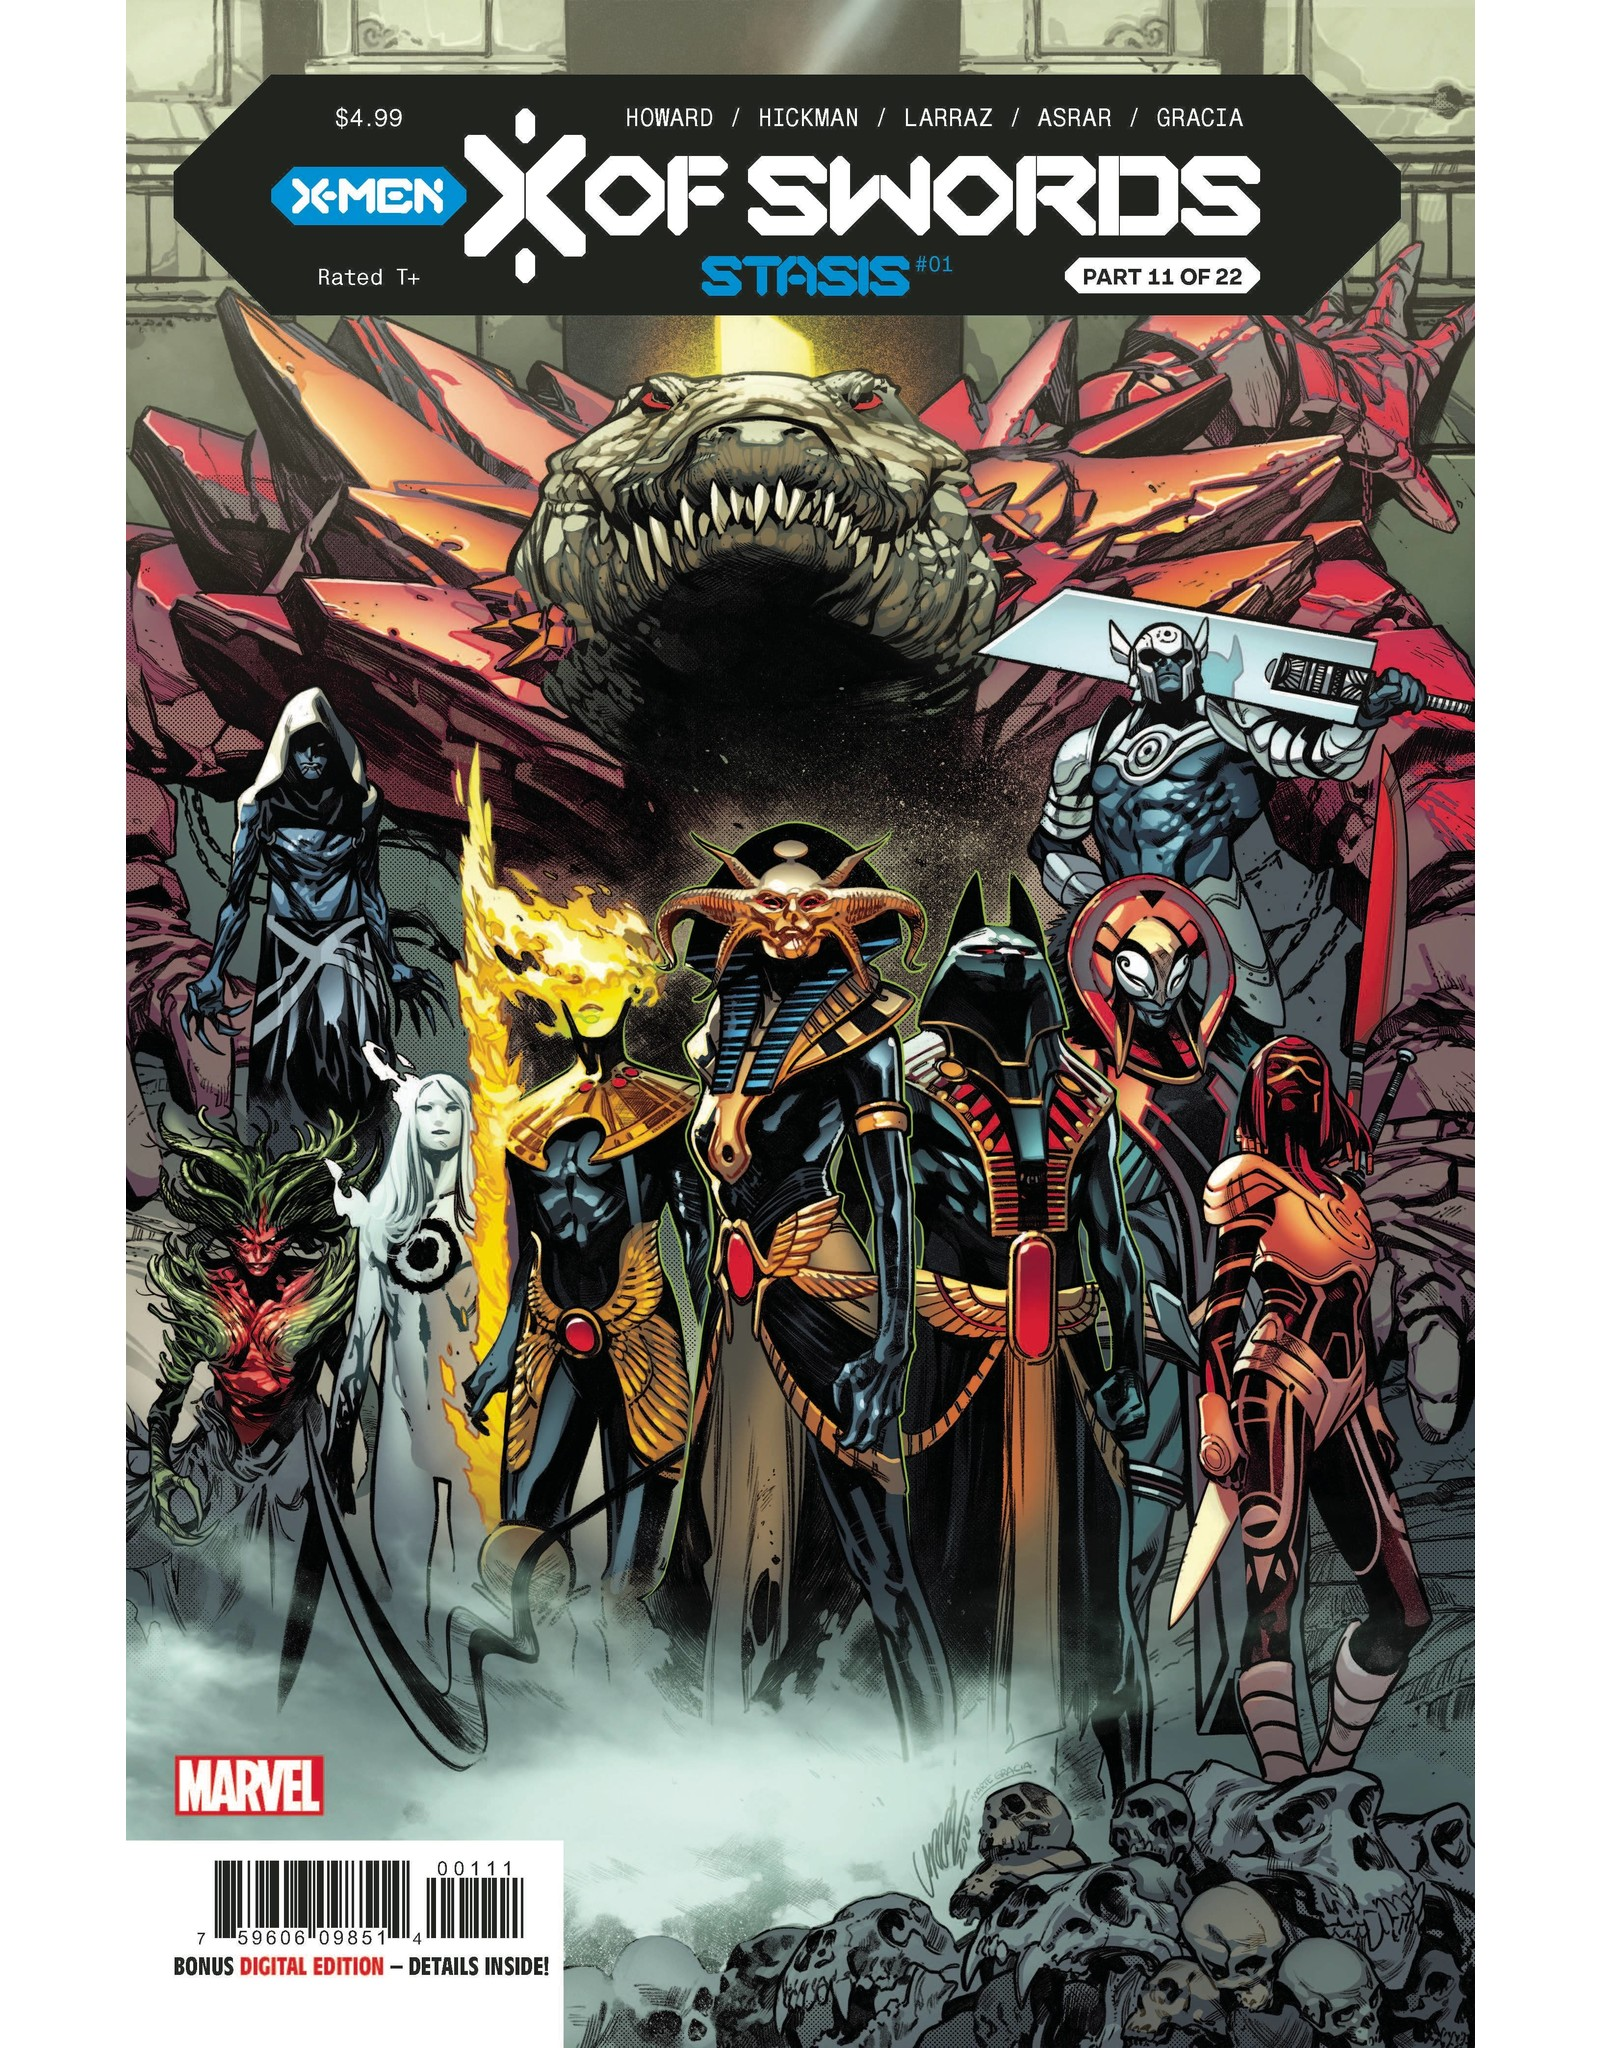 MARVEL COMICS X OF SWORDS STASIS #1